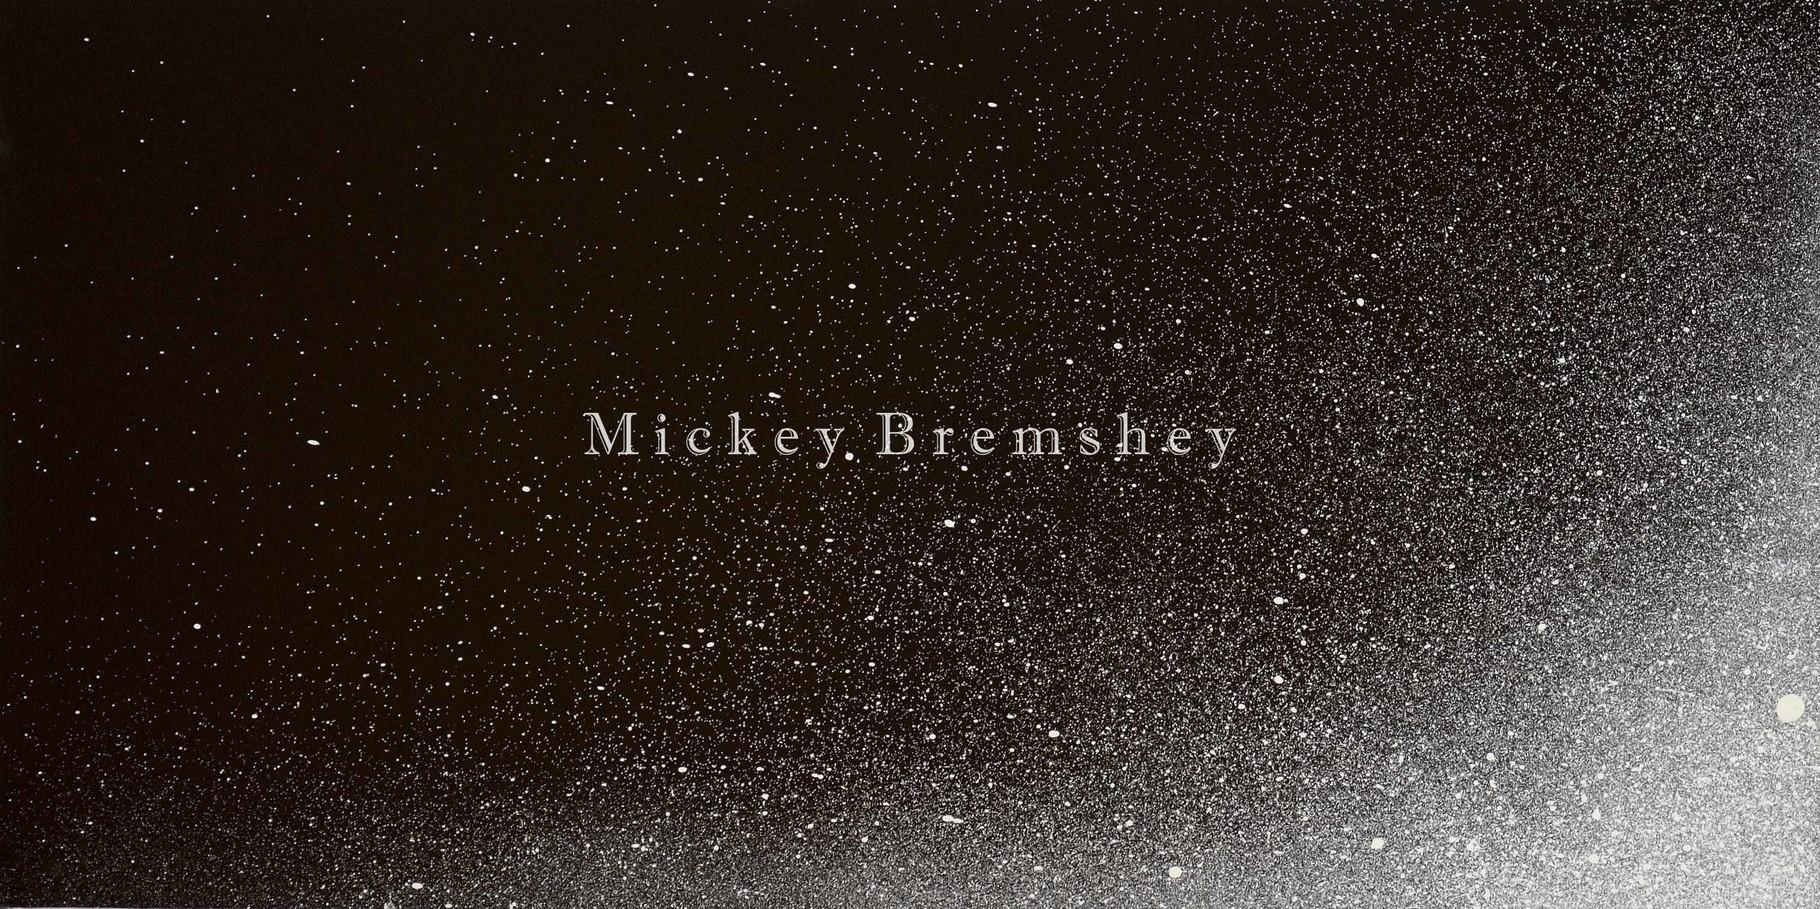 bremshey.atramentum.081275-001